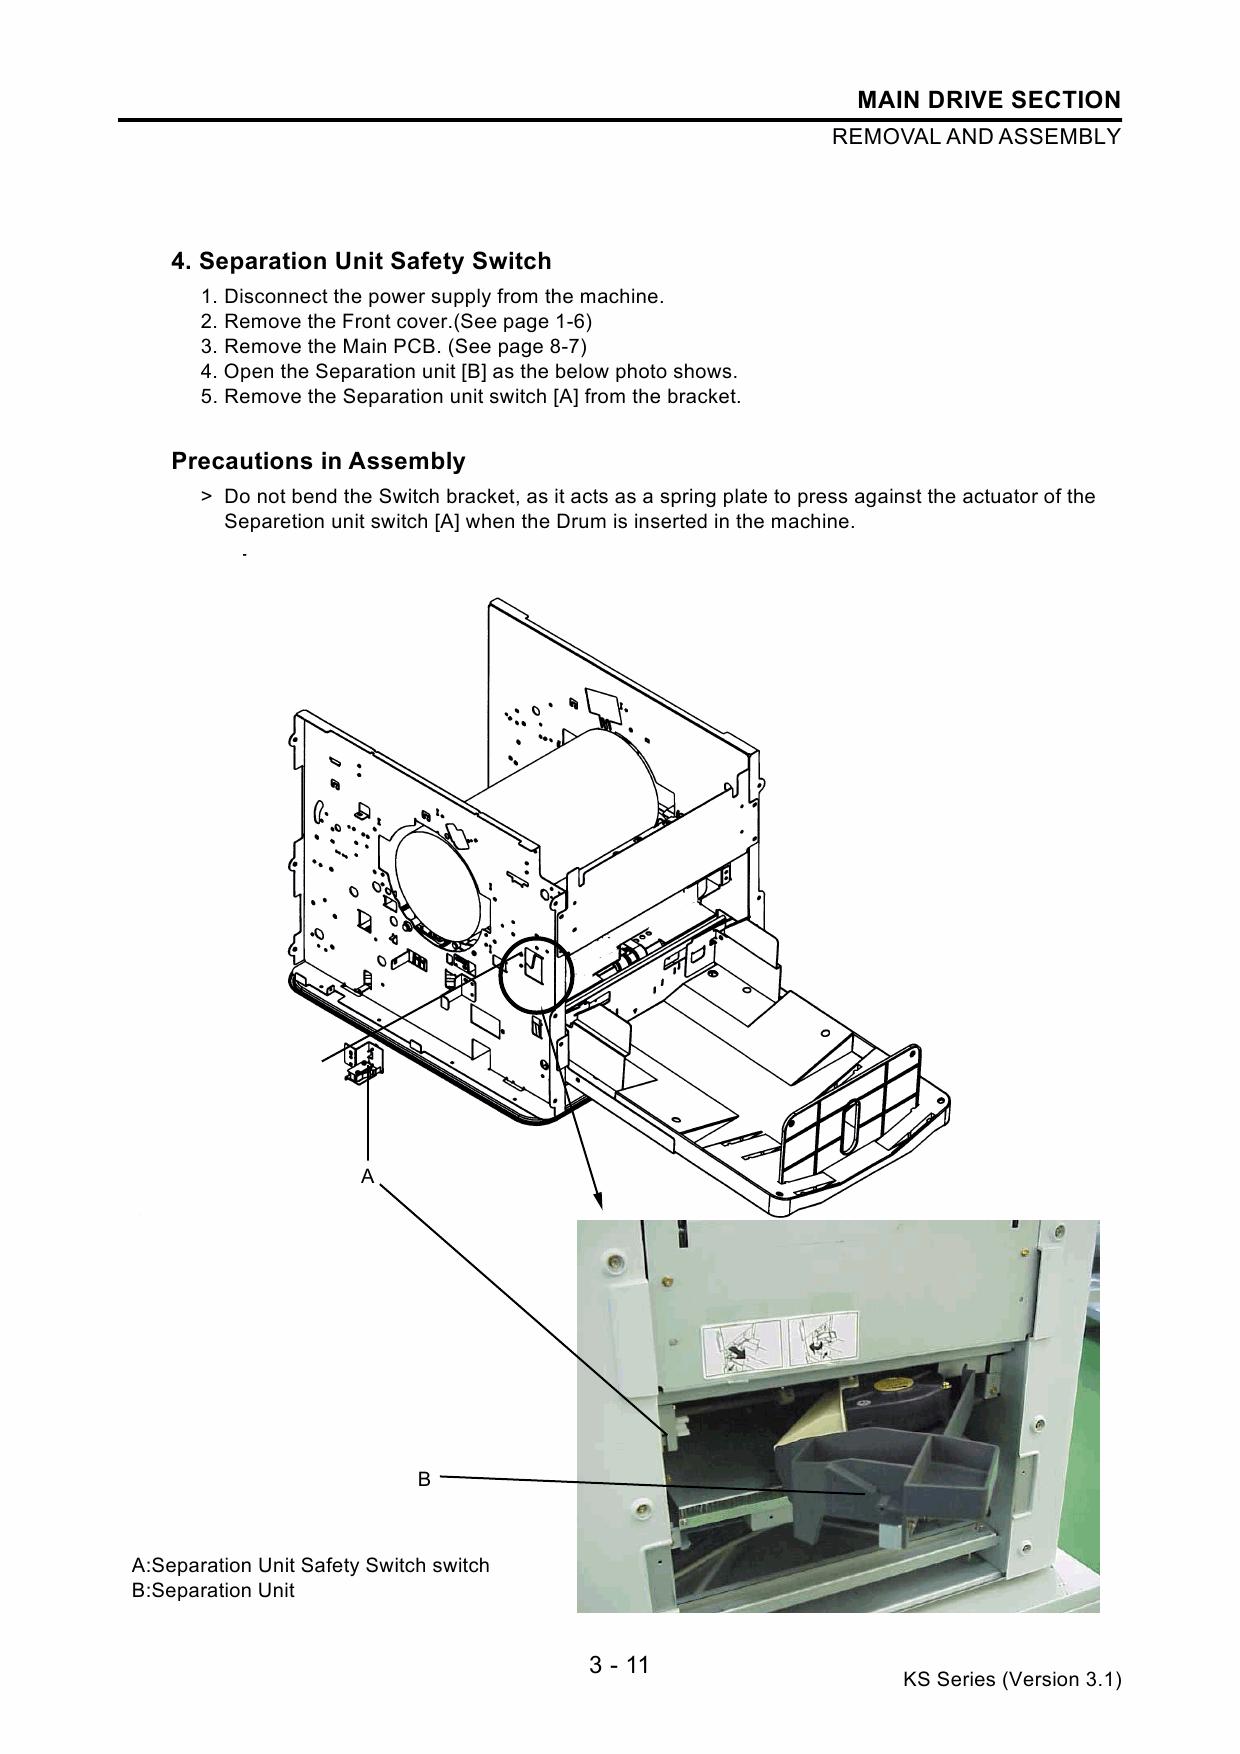 RISO KS 500 600 800 TECHNICAL Service Manual-2